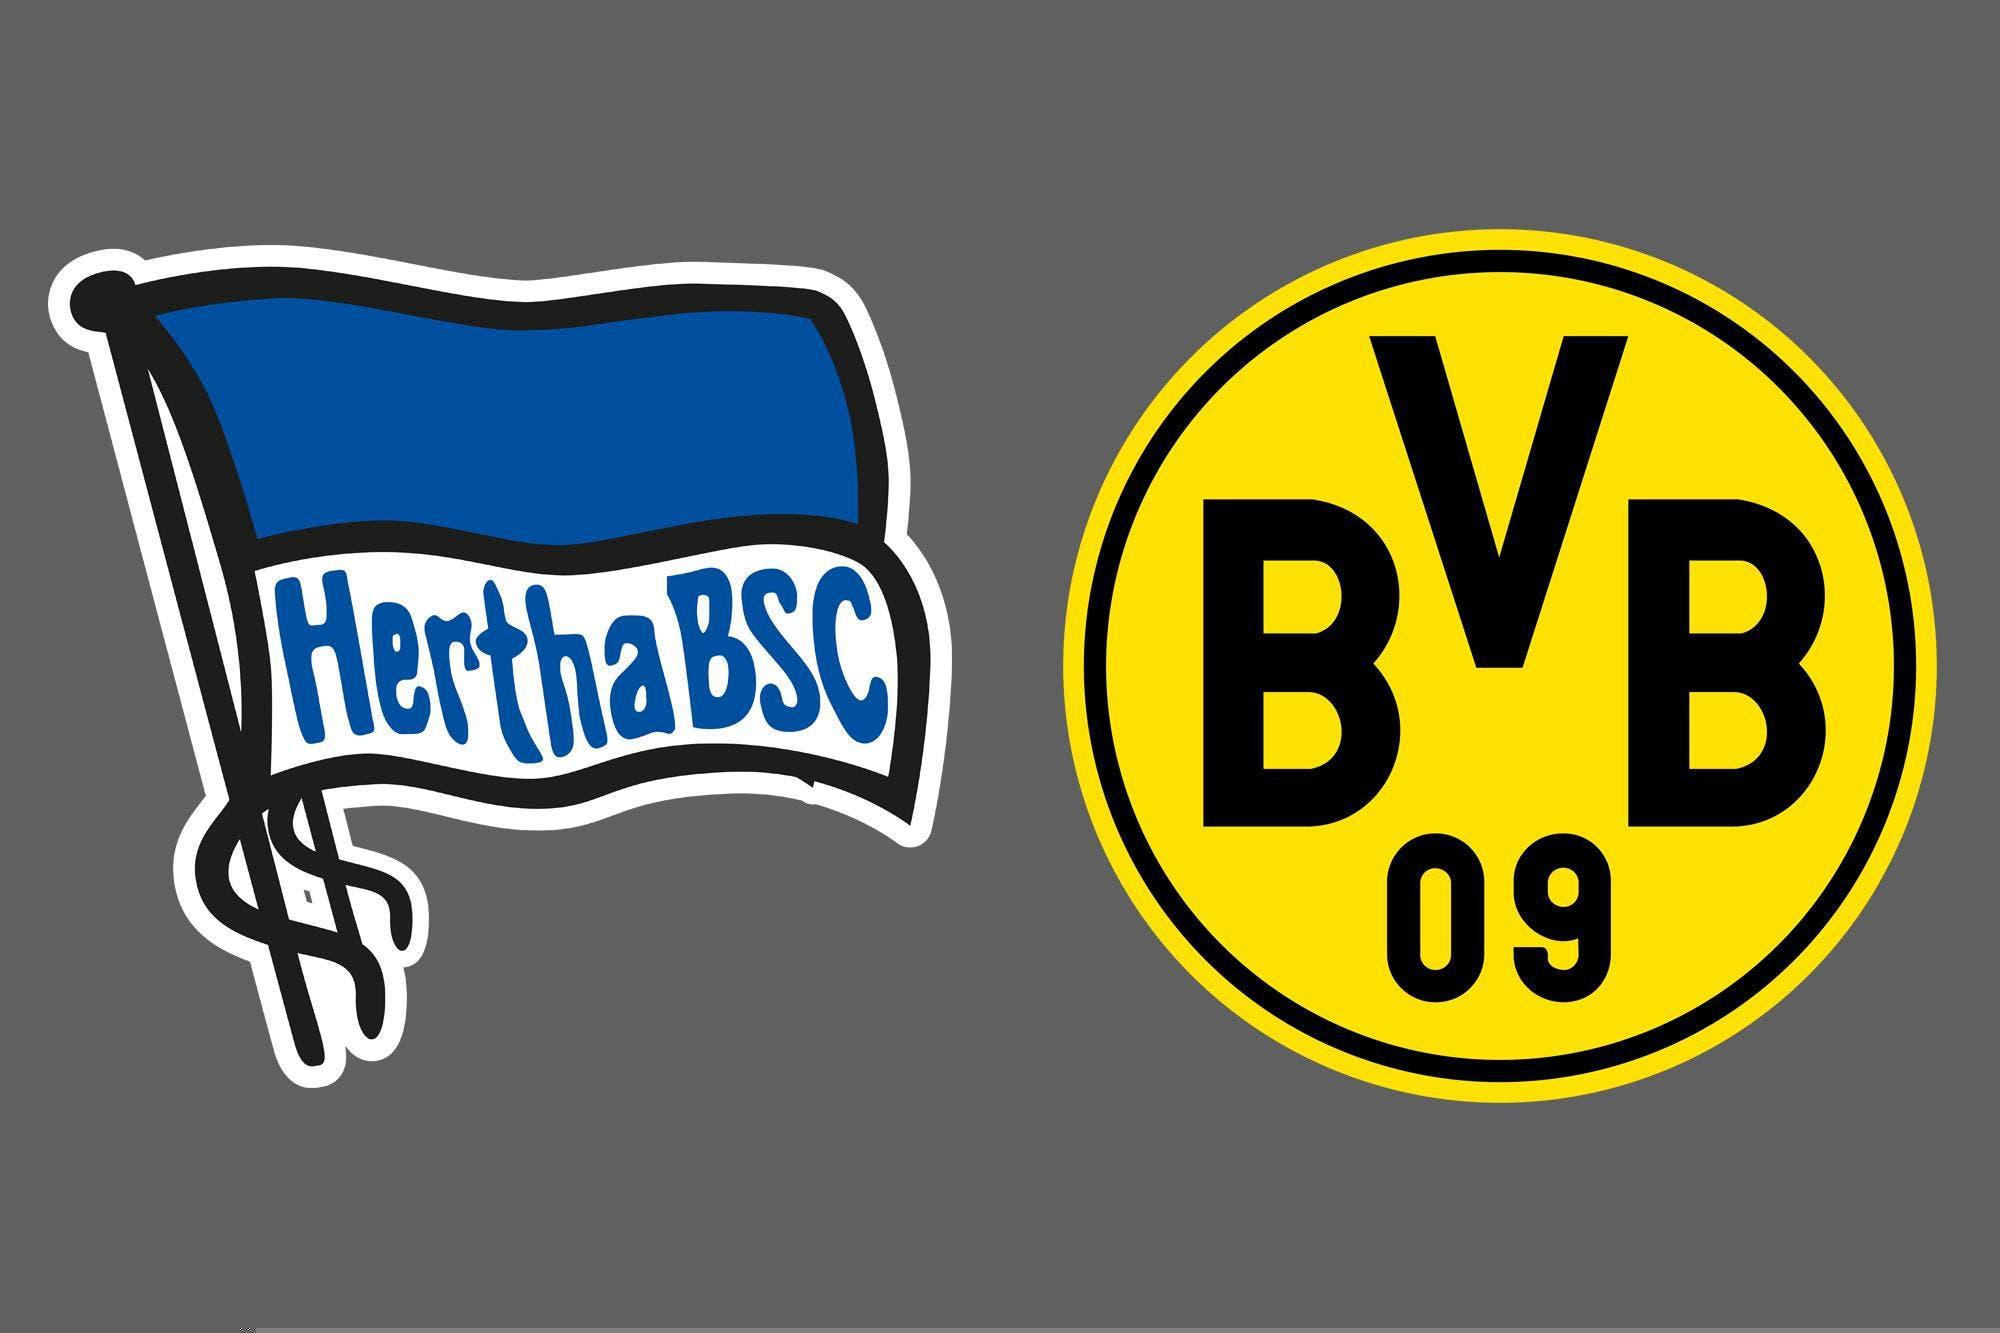 Bundesliga de Alemania: Borussia Dortmund venció por 5-2 a Hertha Berlin como visitante